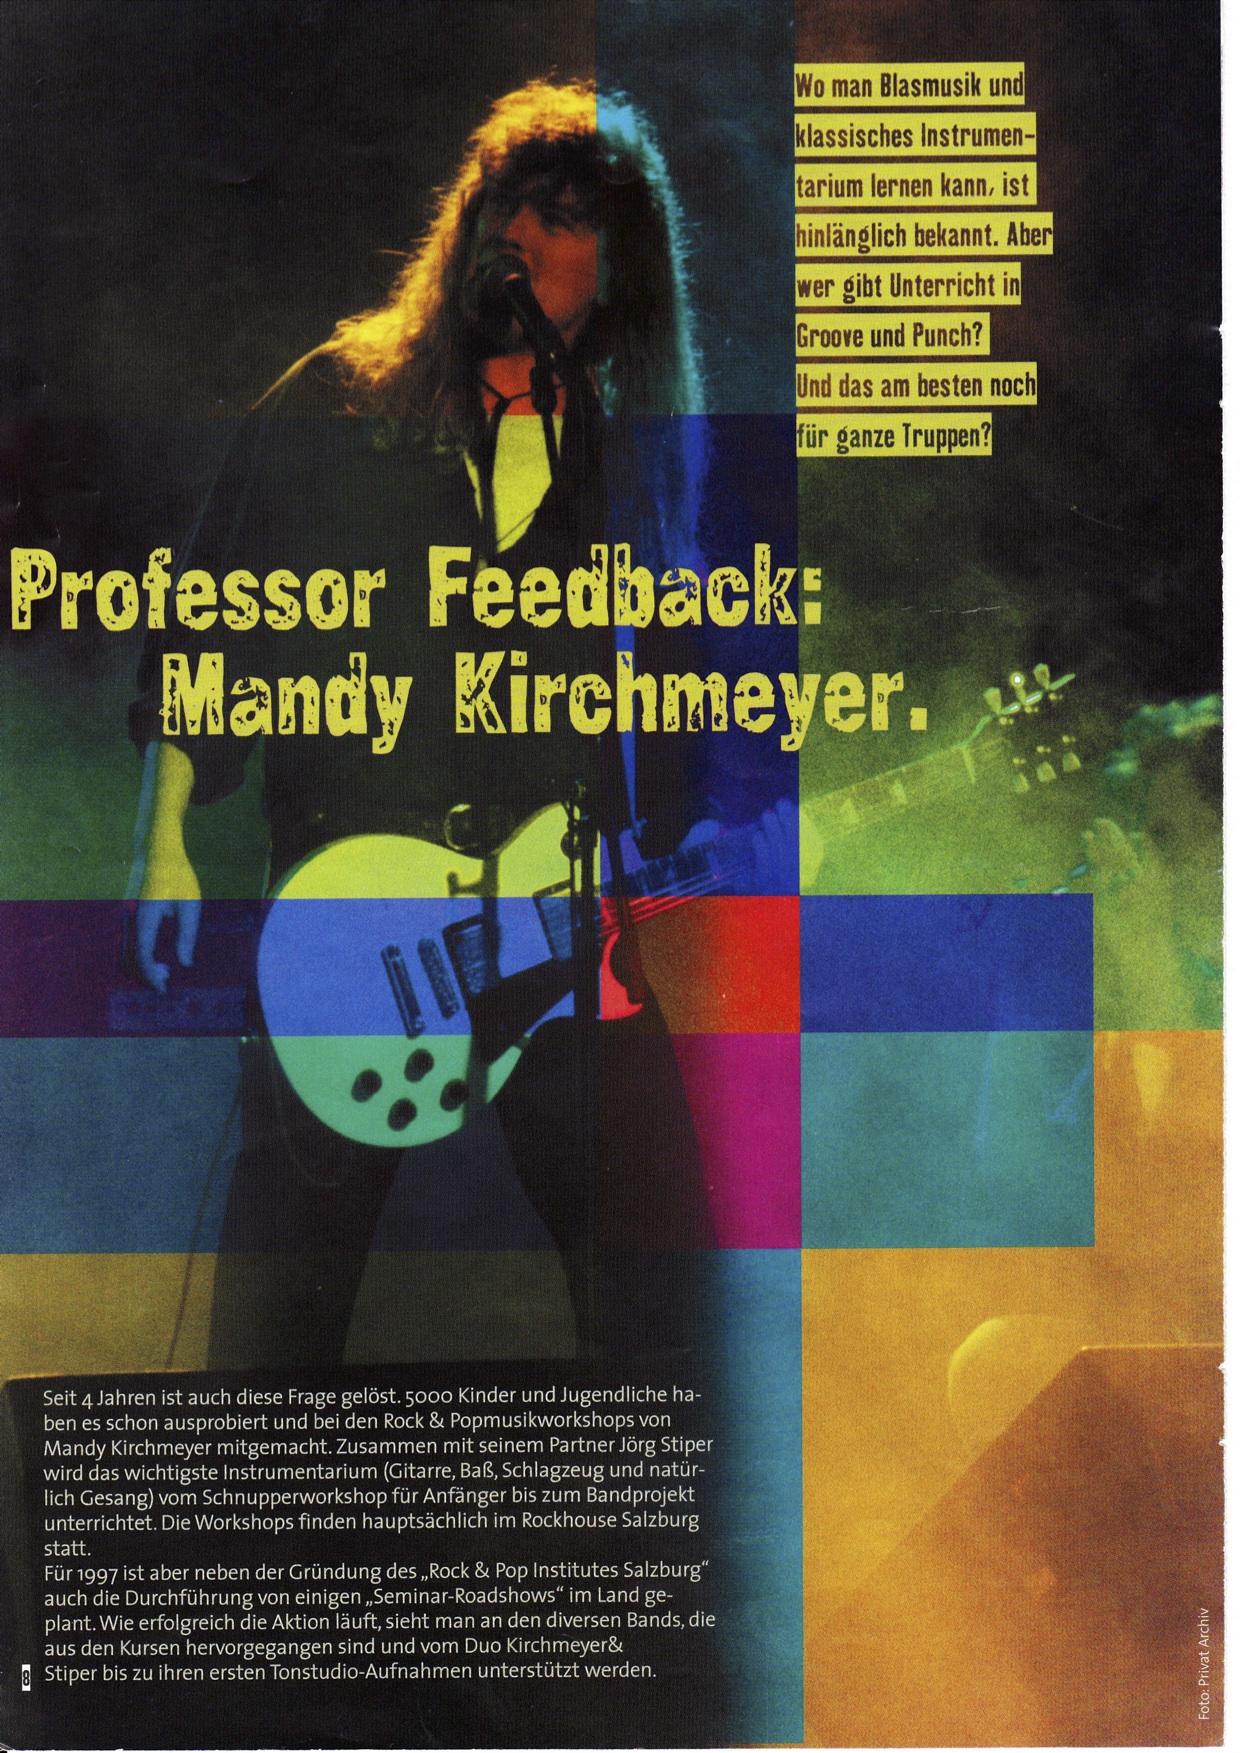 ProfessorFeedback.jpg